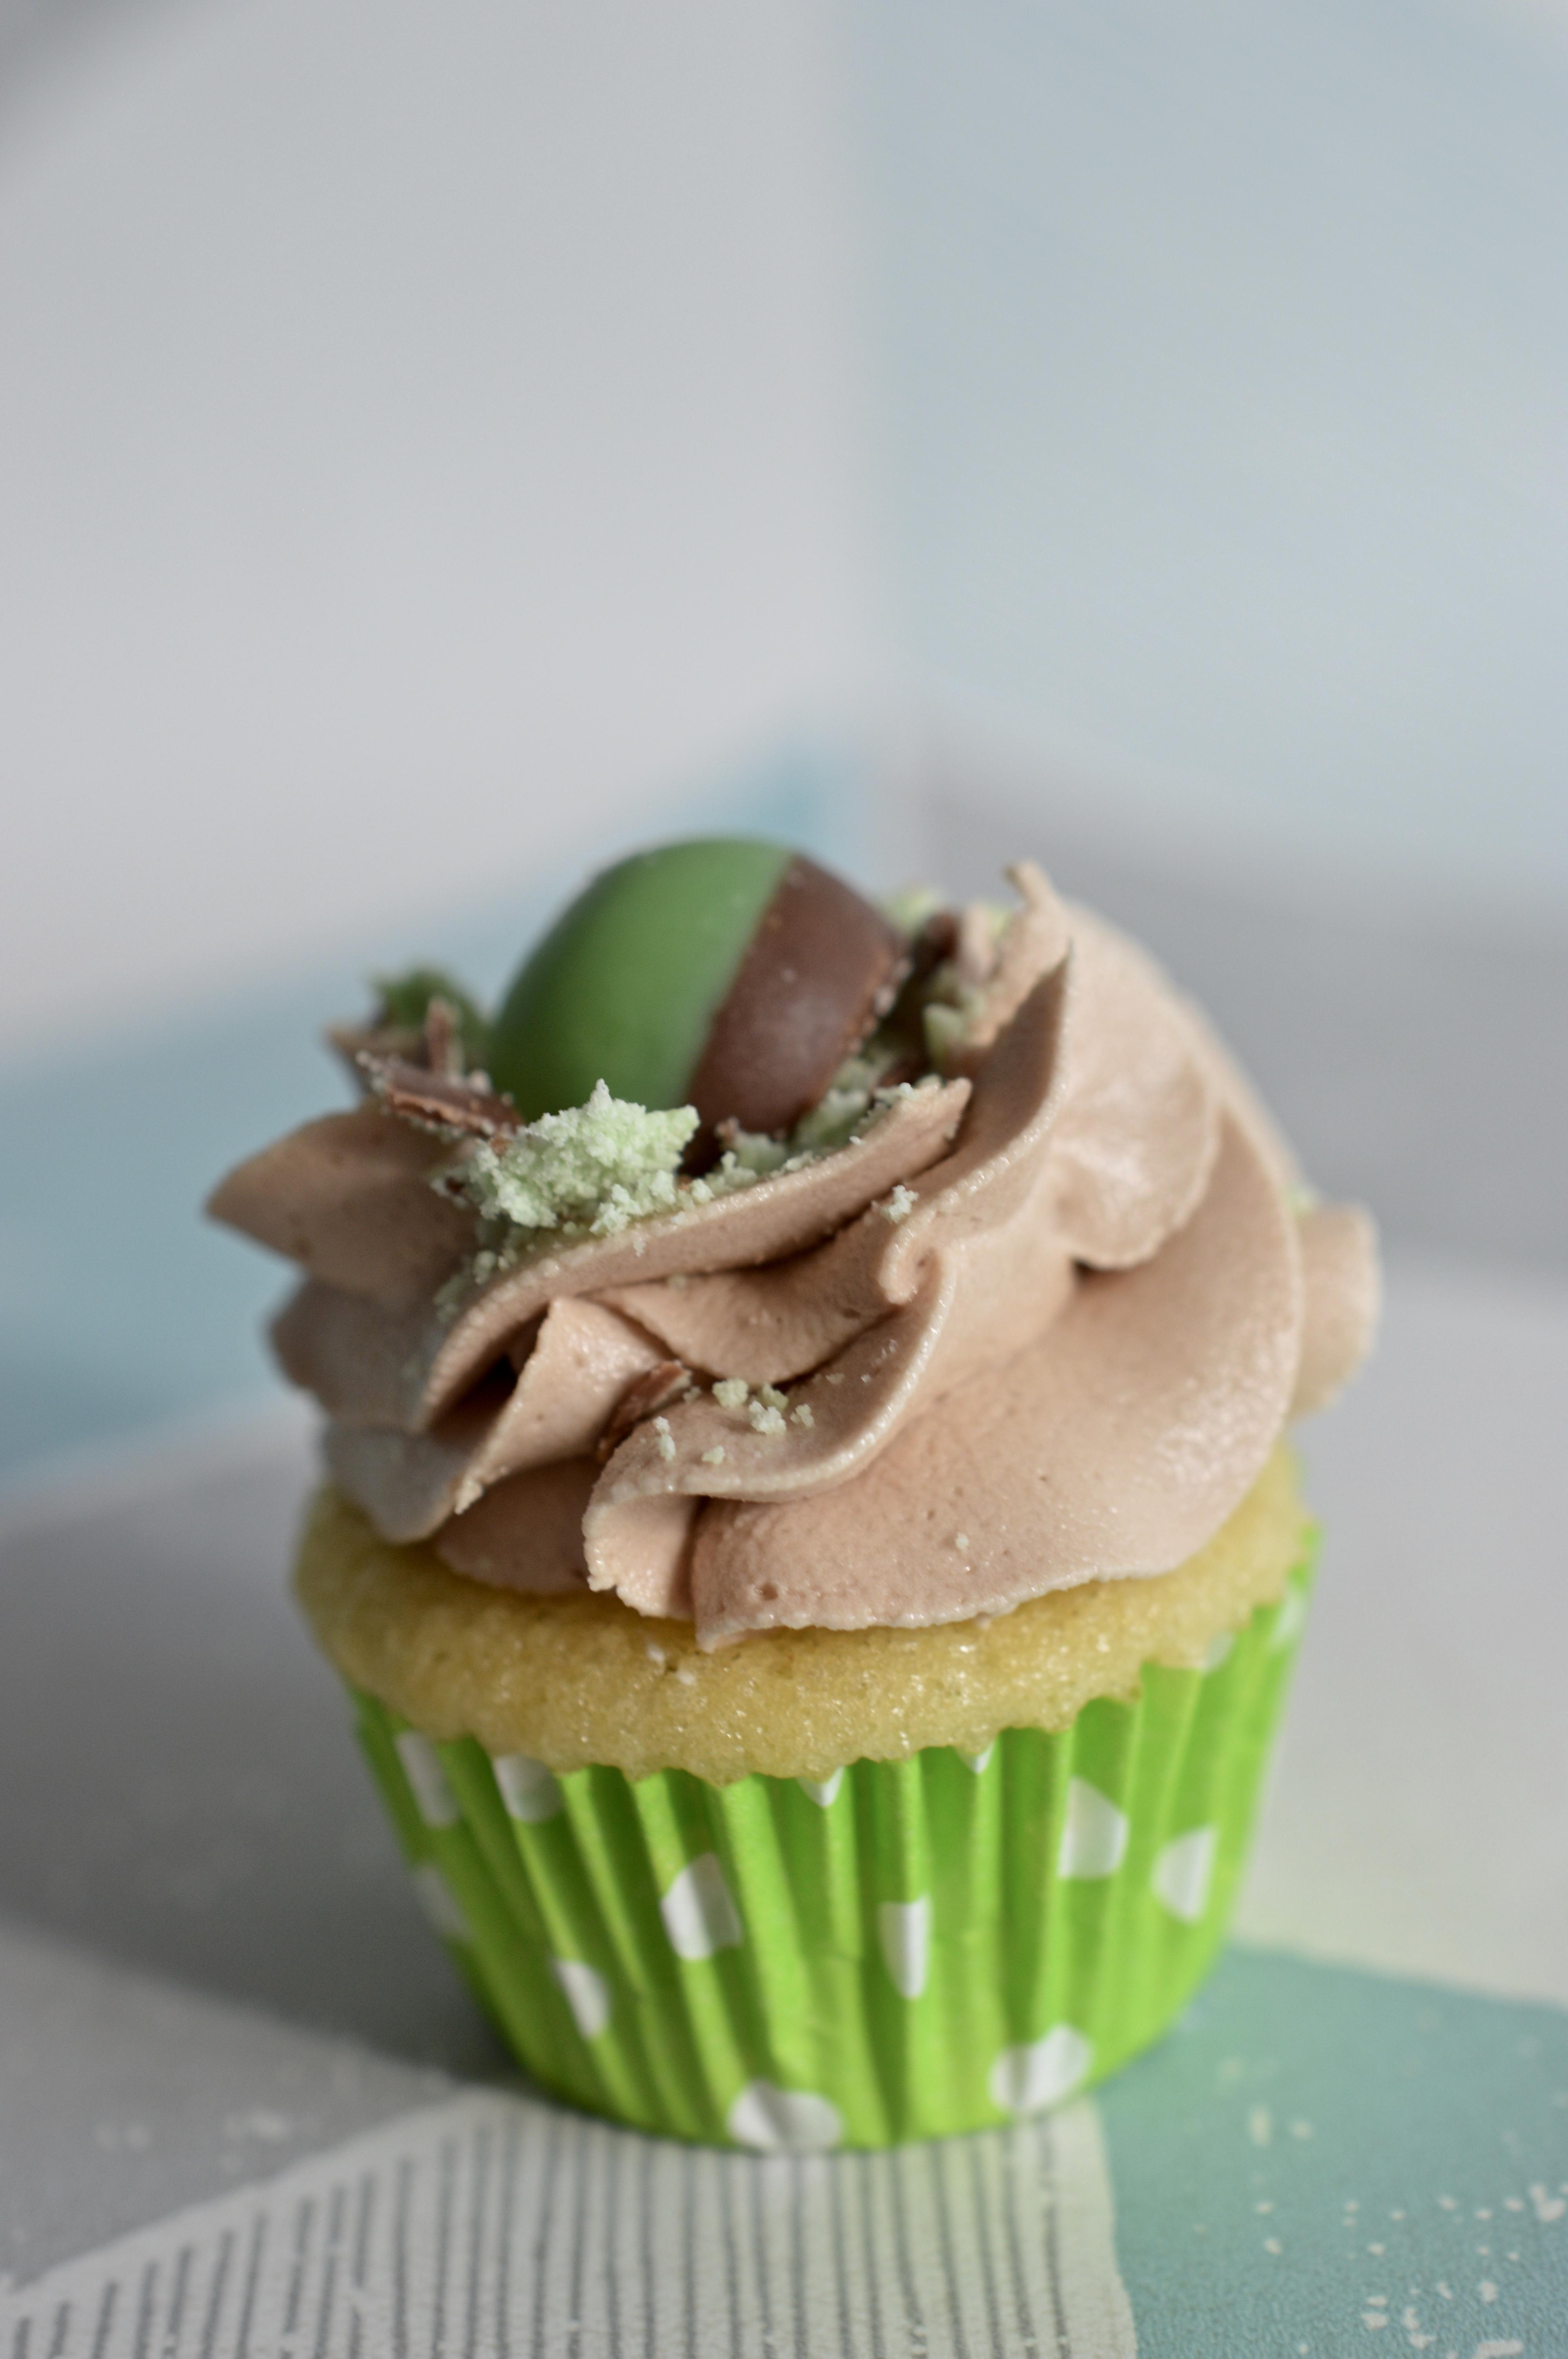 Mini Mint Aero Cupcake